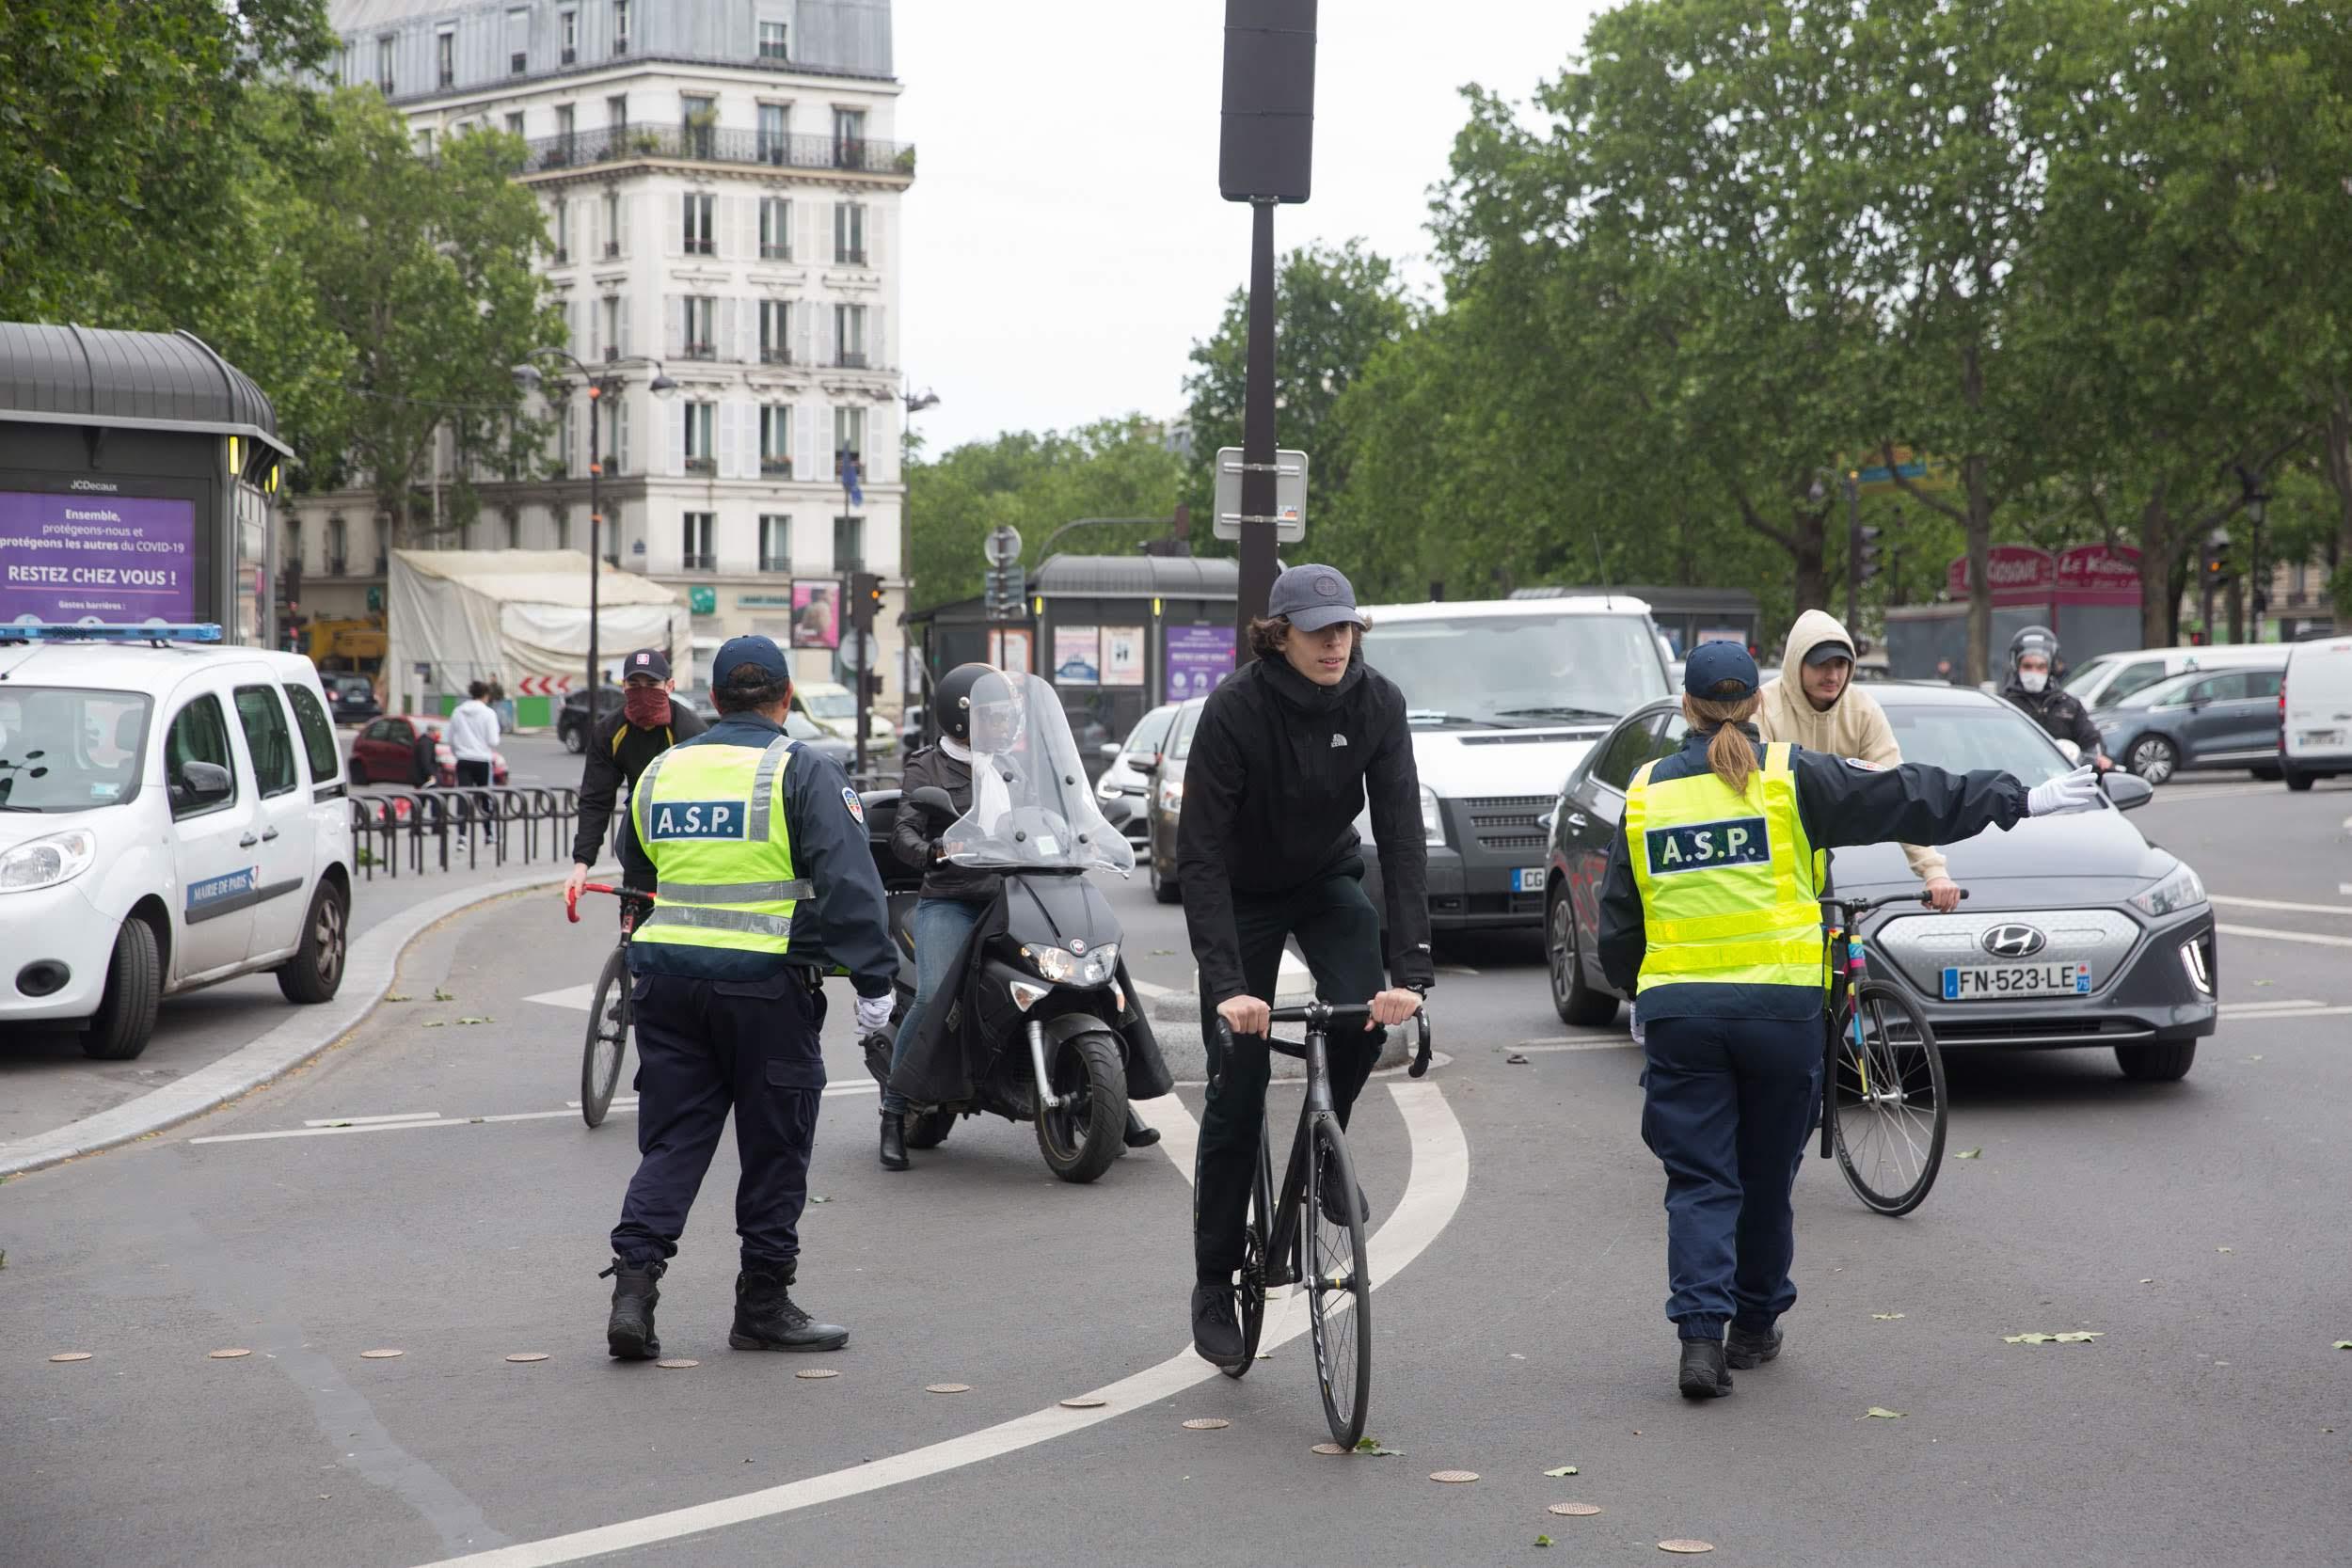 Fermeture de la Rue de Rivoli, filtrage place de la Bastille